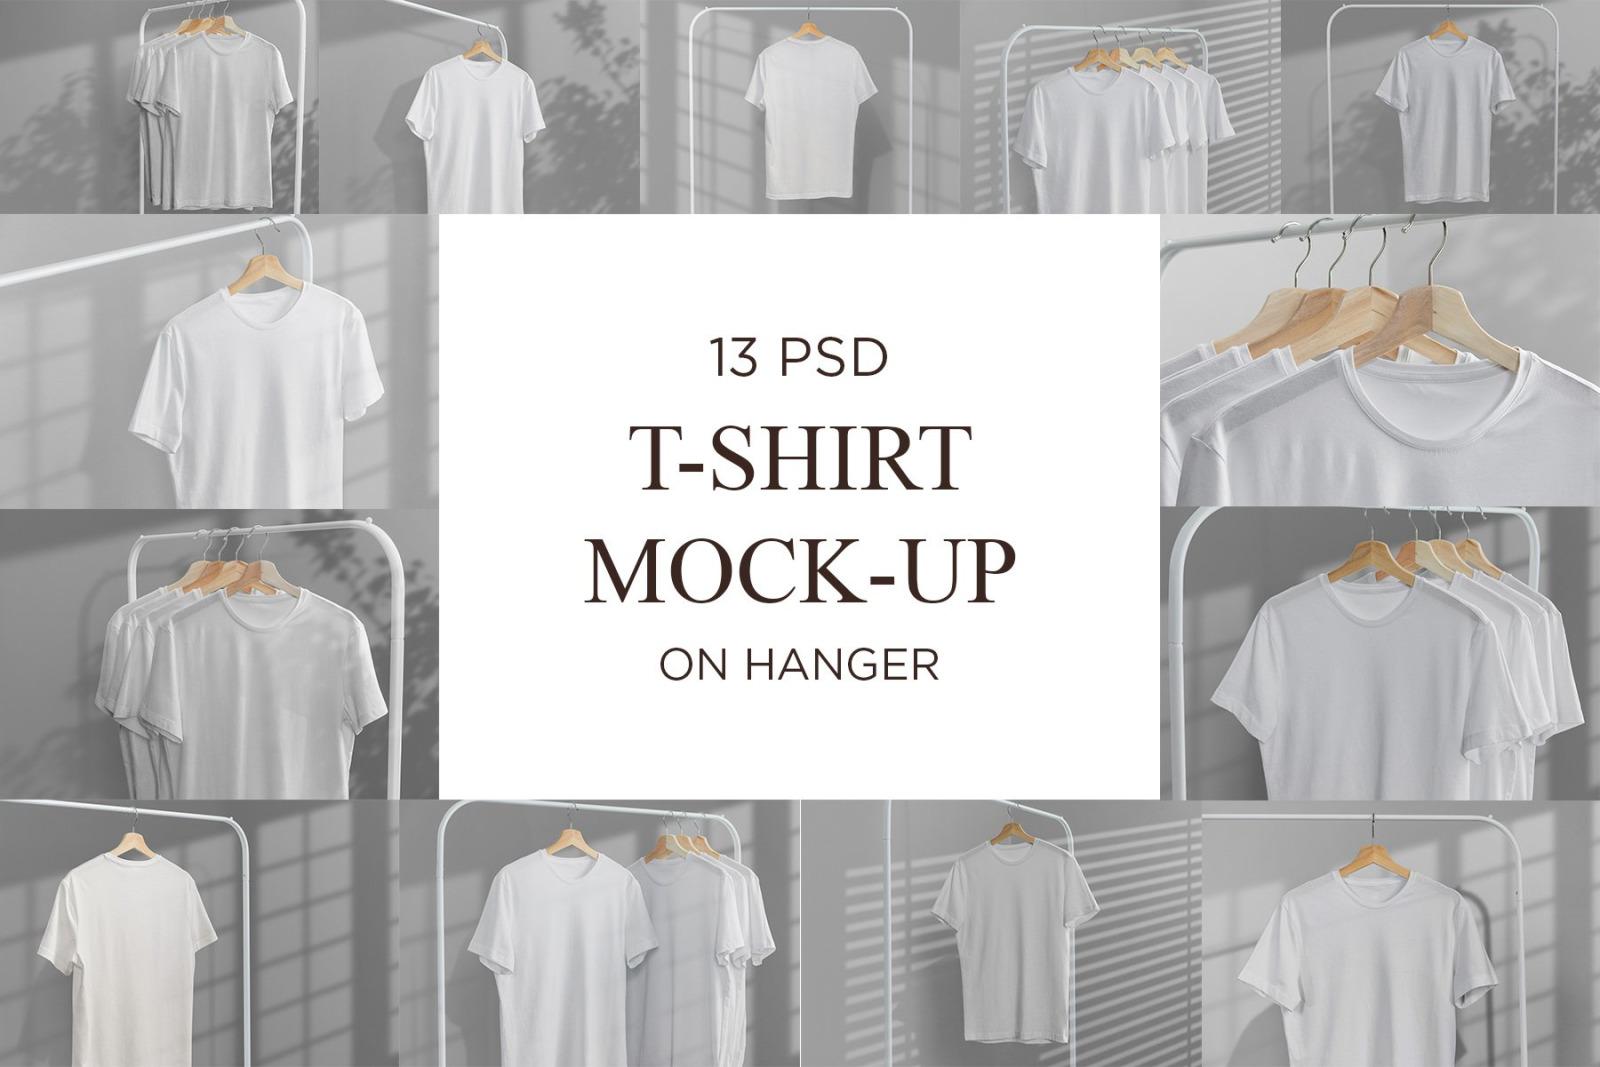 T-Shirt Mock-Up on Hanger